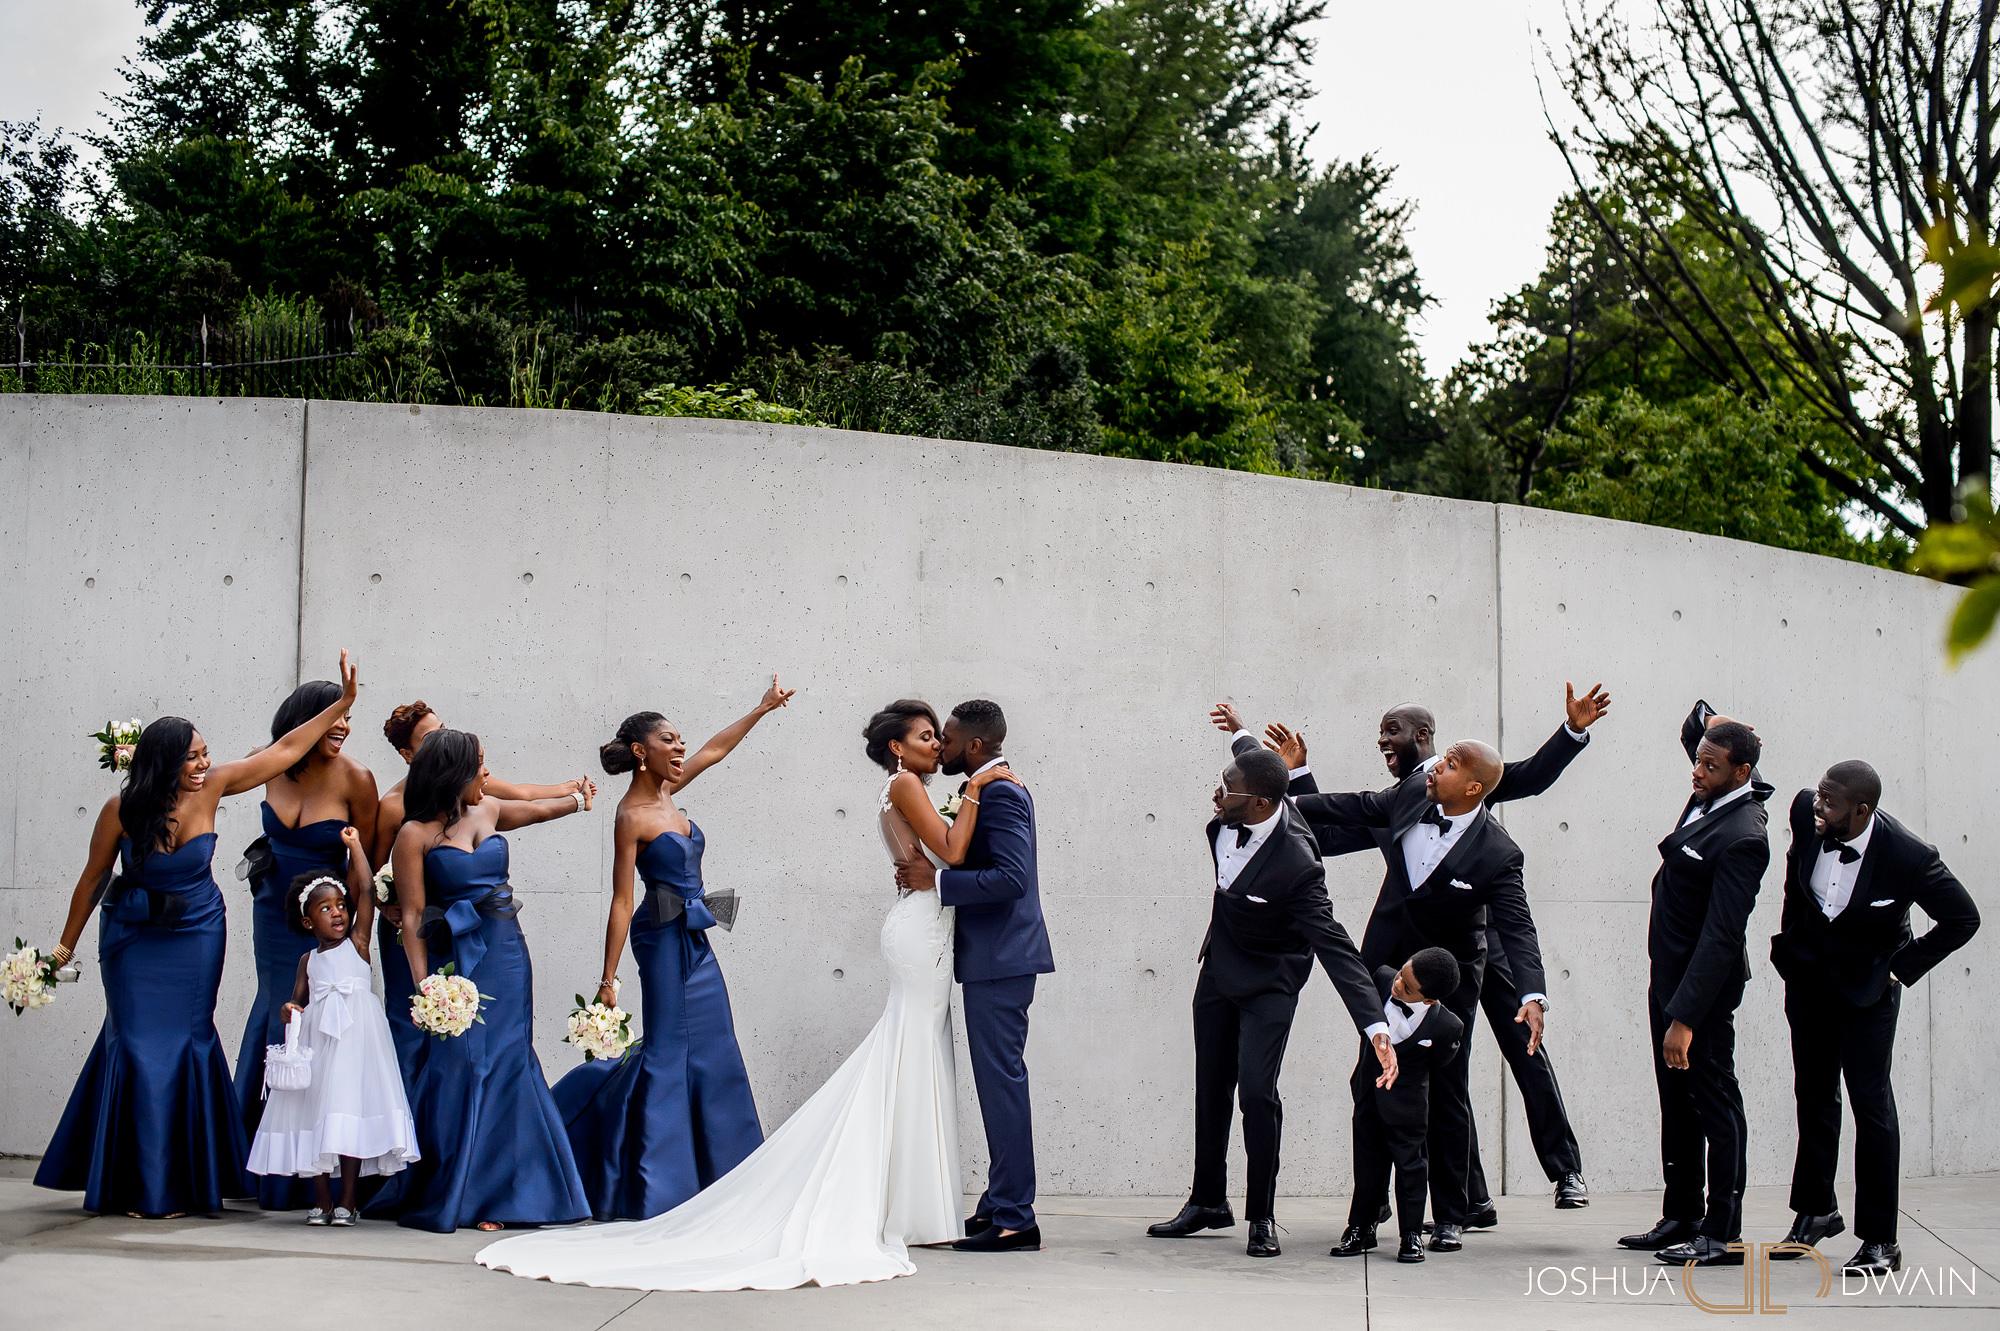 joshua-dwain-weddings-gallery-best-wedding-photographers-us-023